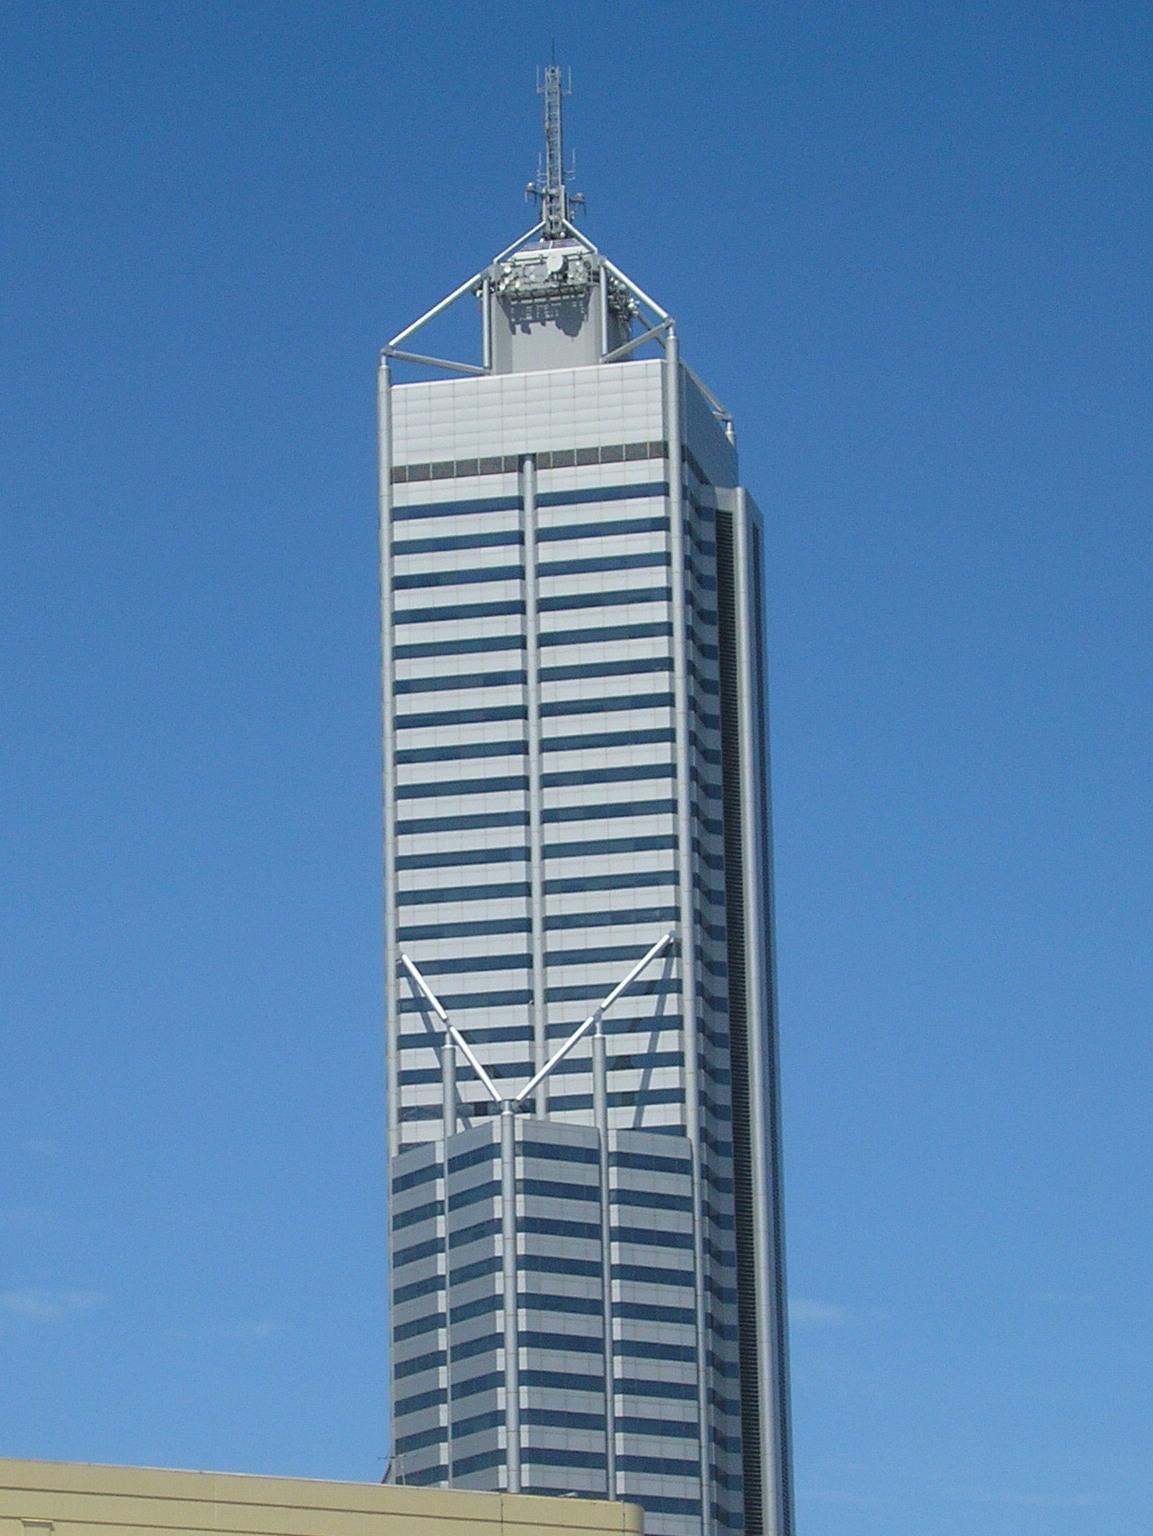 bangkoks new tallest maha nakon 1080 215 1349 cityporn